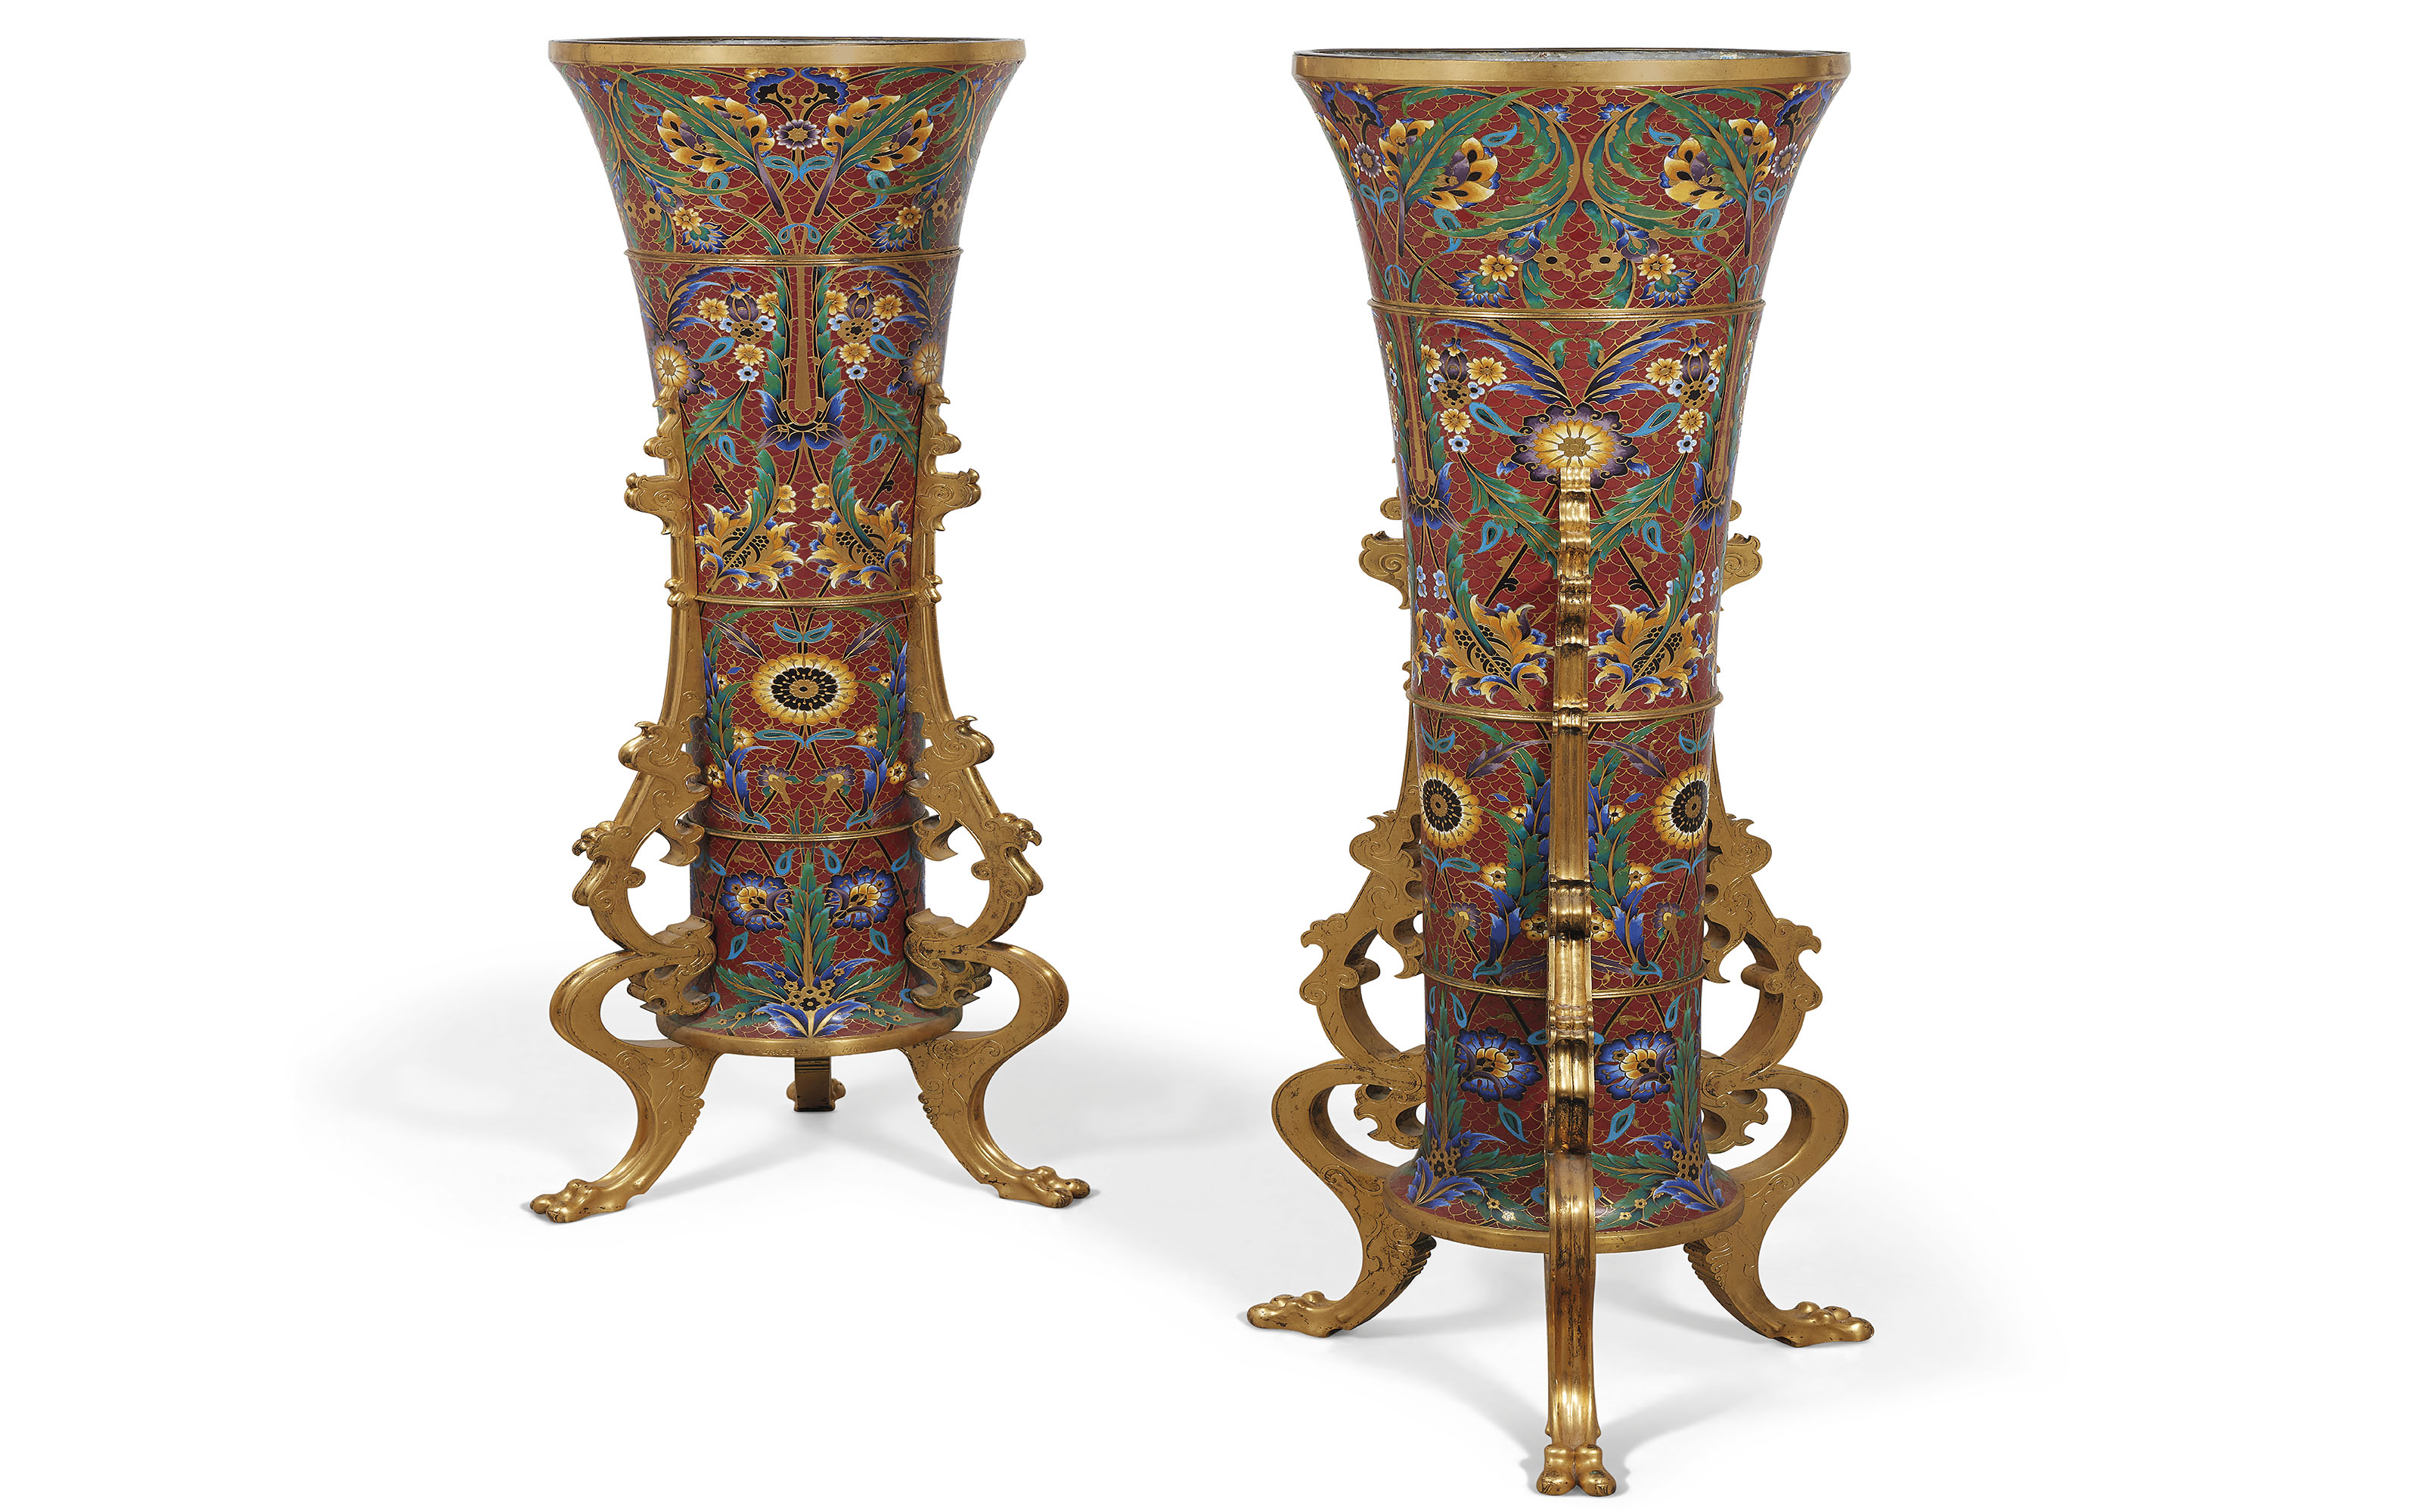 The Exceptional Sale, Paris auction at Christies